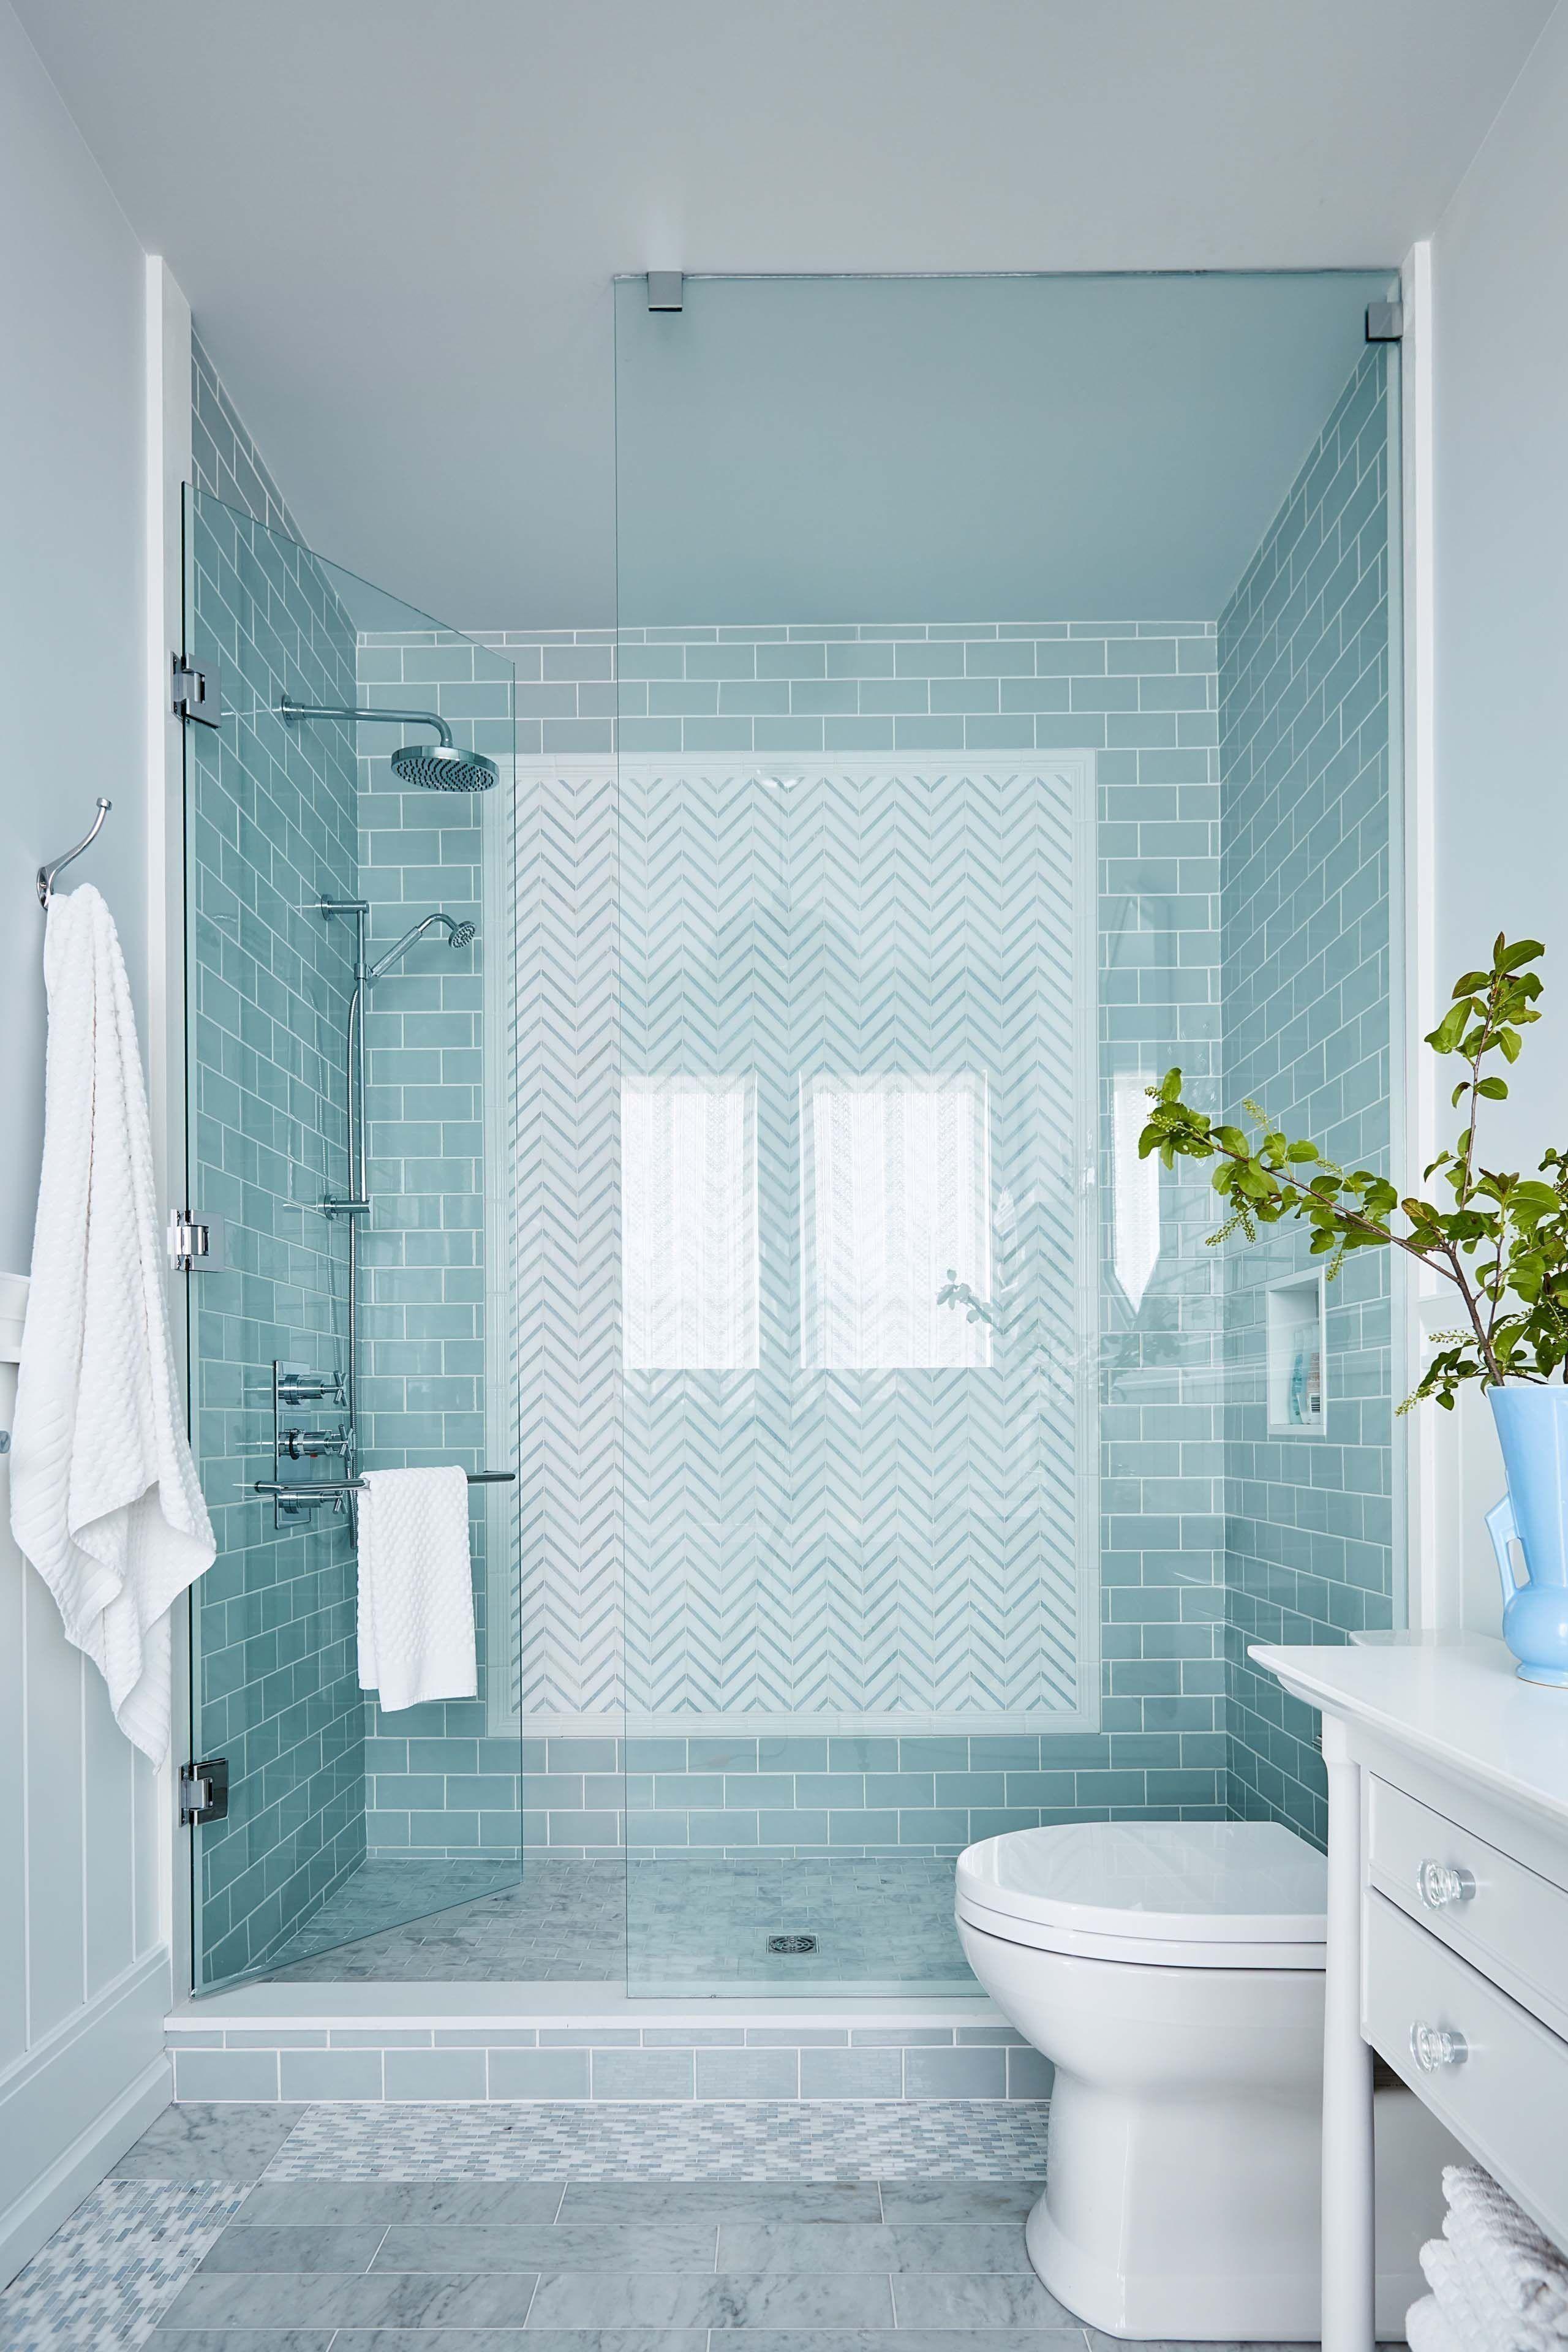 51 Amazing Pictorial Floor Design Ideas For Your Bathroom Https Coziem Com Index Php 20 Bathroom Tile Designs Bathroom Remodel Master Simple Bathroom Designs